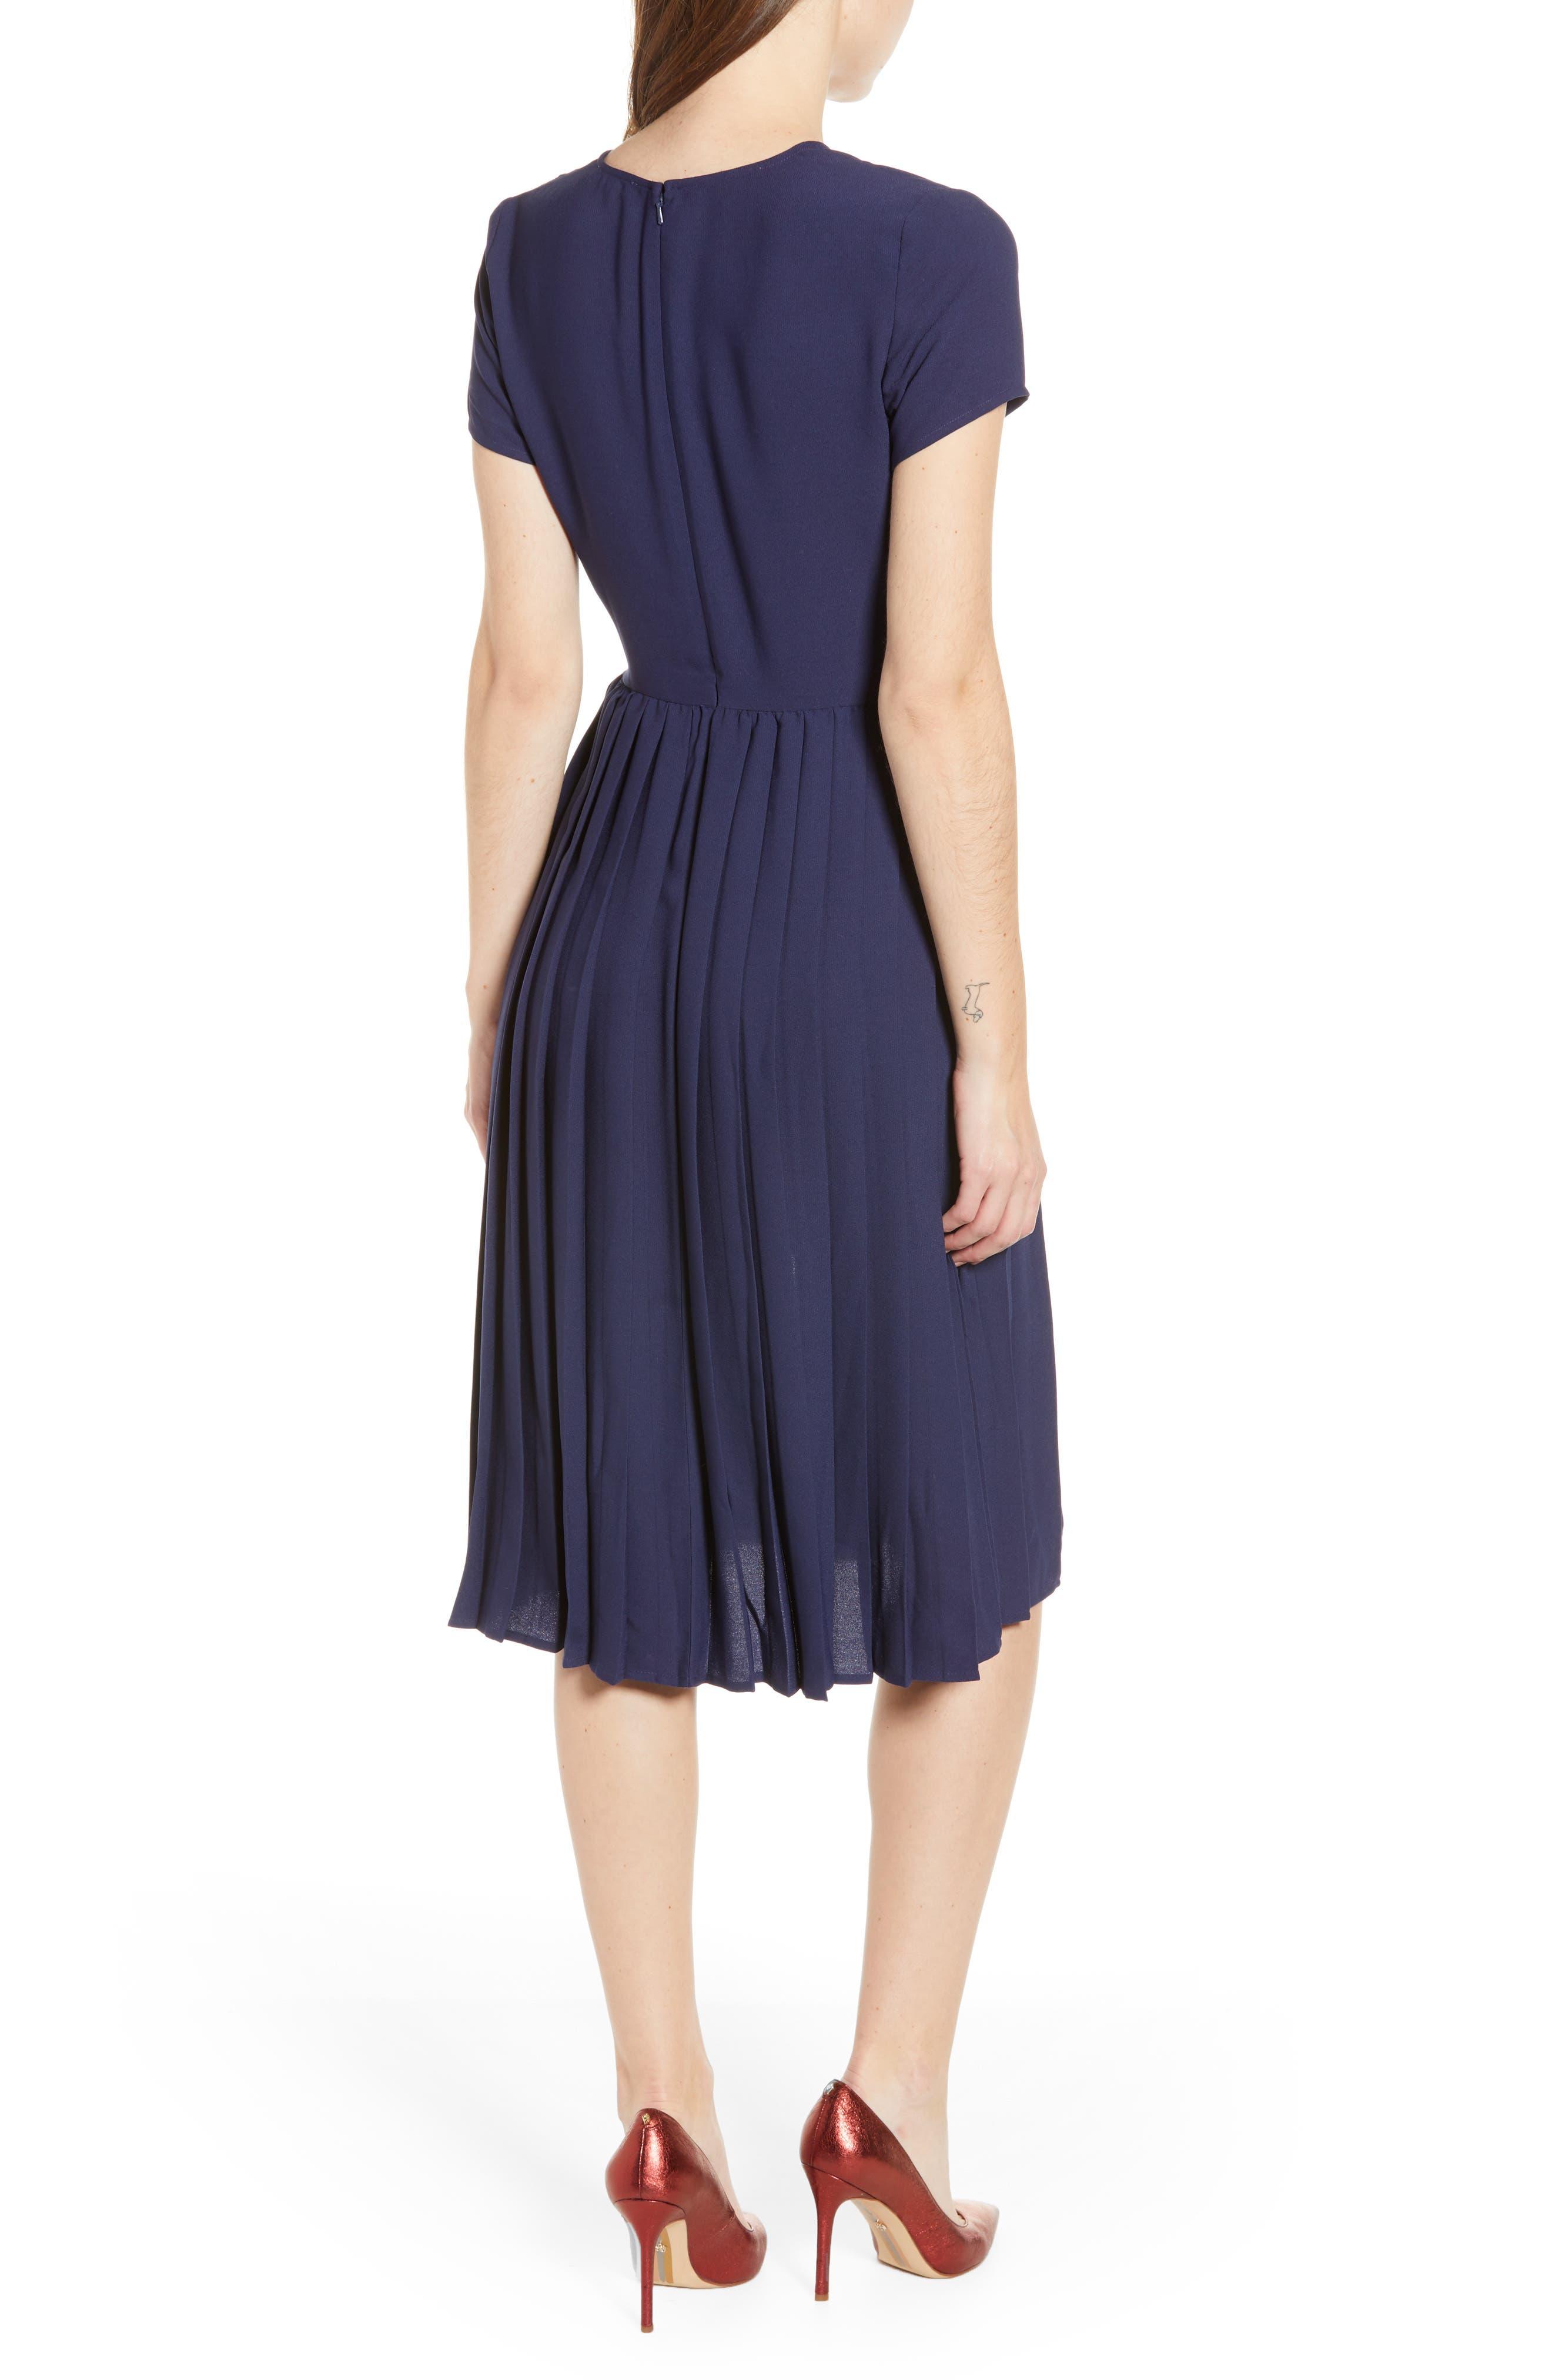 LEITH,                             Pleated Surplice Dress,                             Alternate thumbnail 3, color,                             NAVY PEACOAT